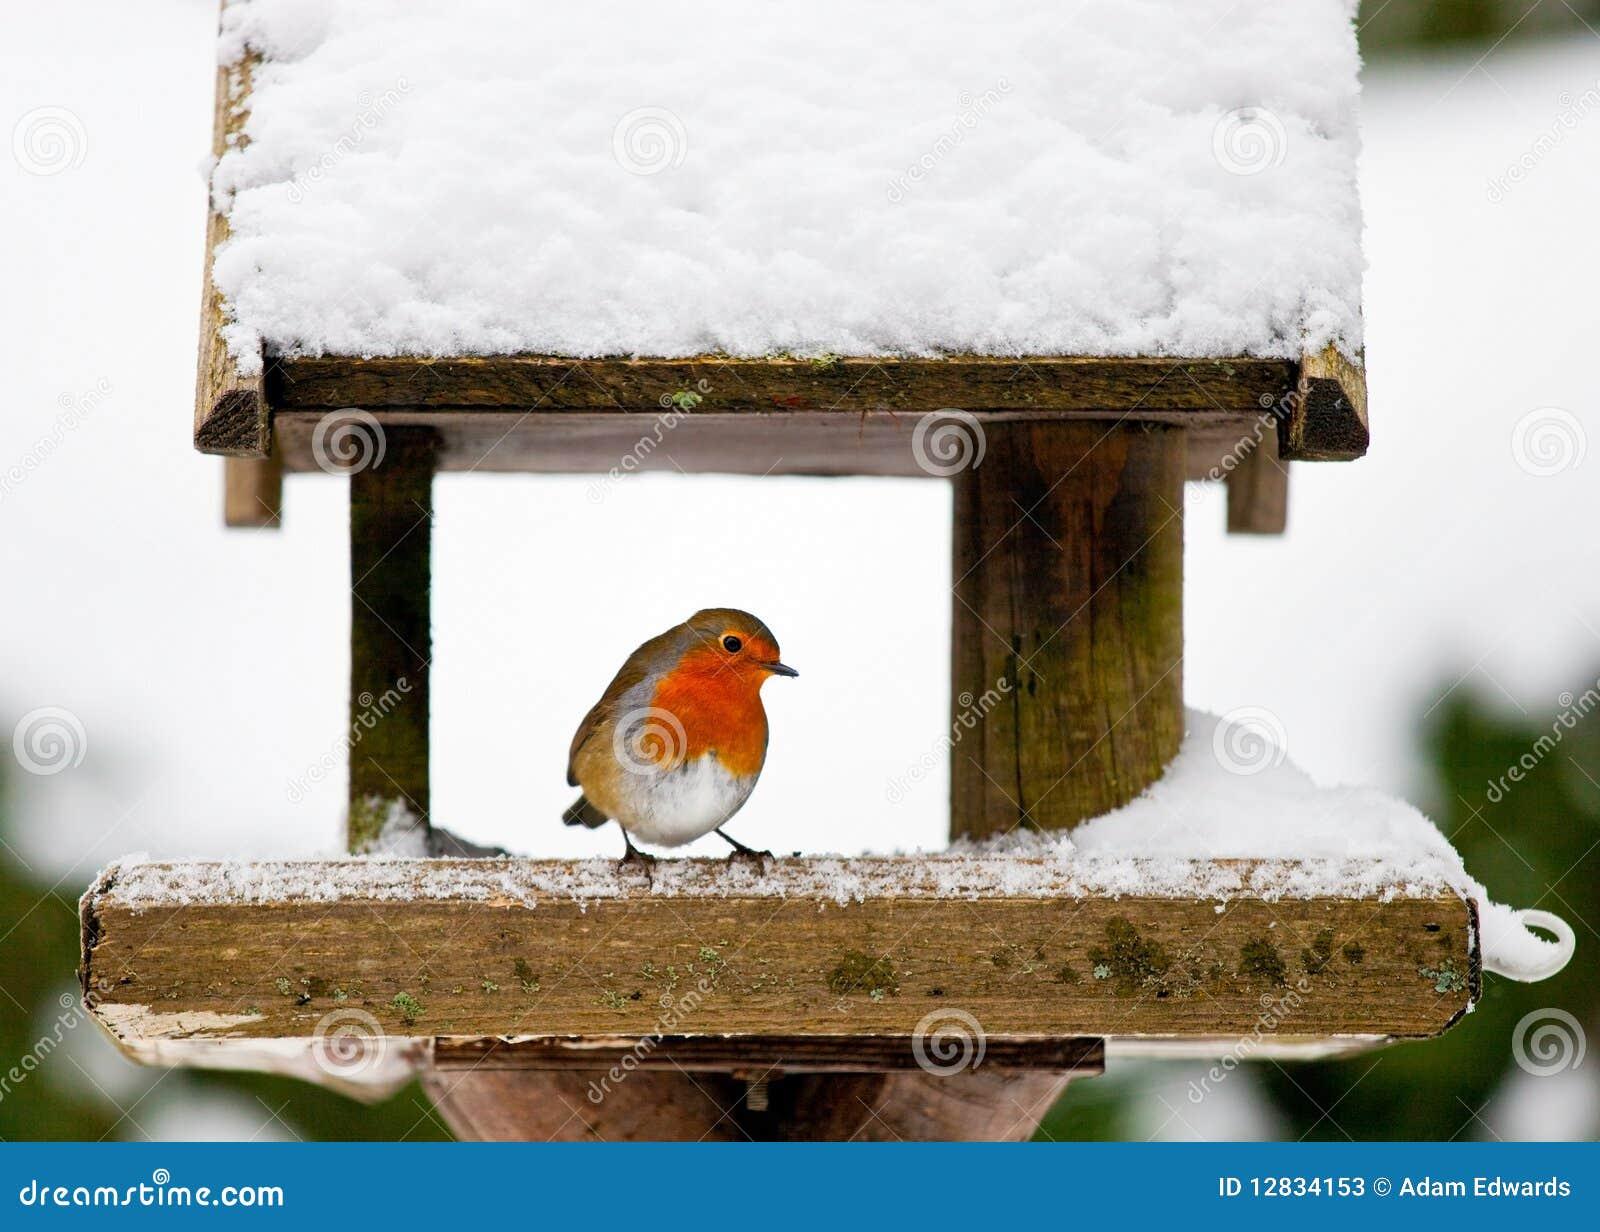 Robin at a snowy bird feeder in winter